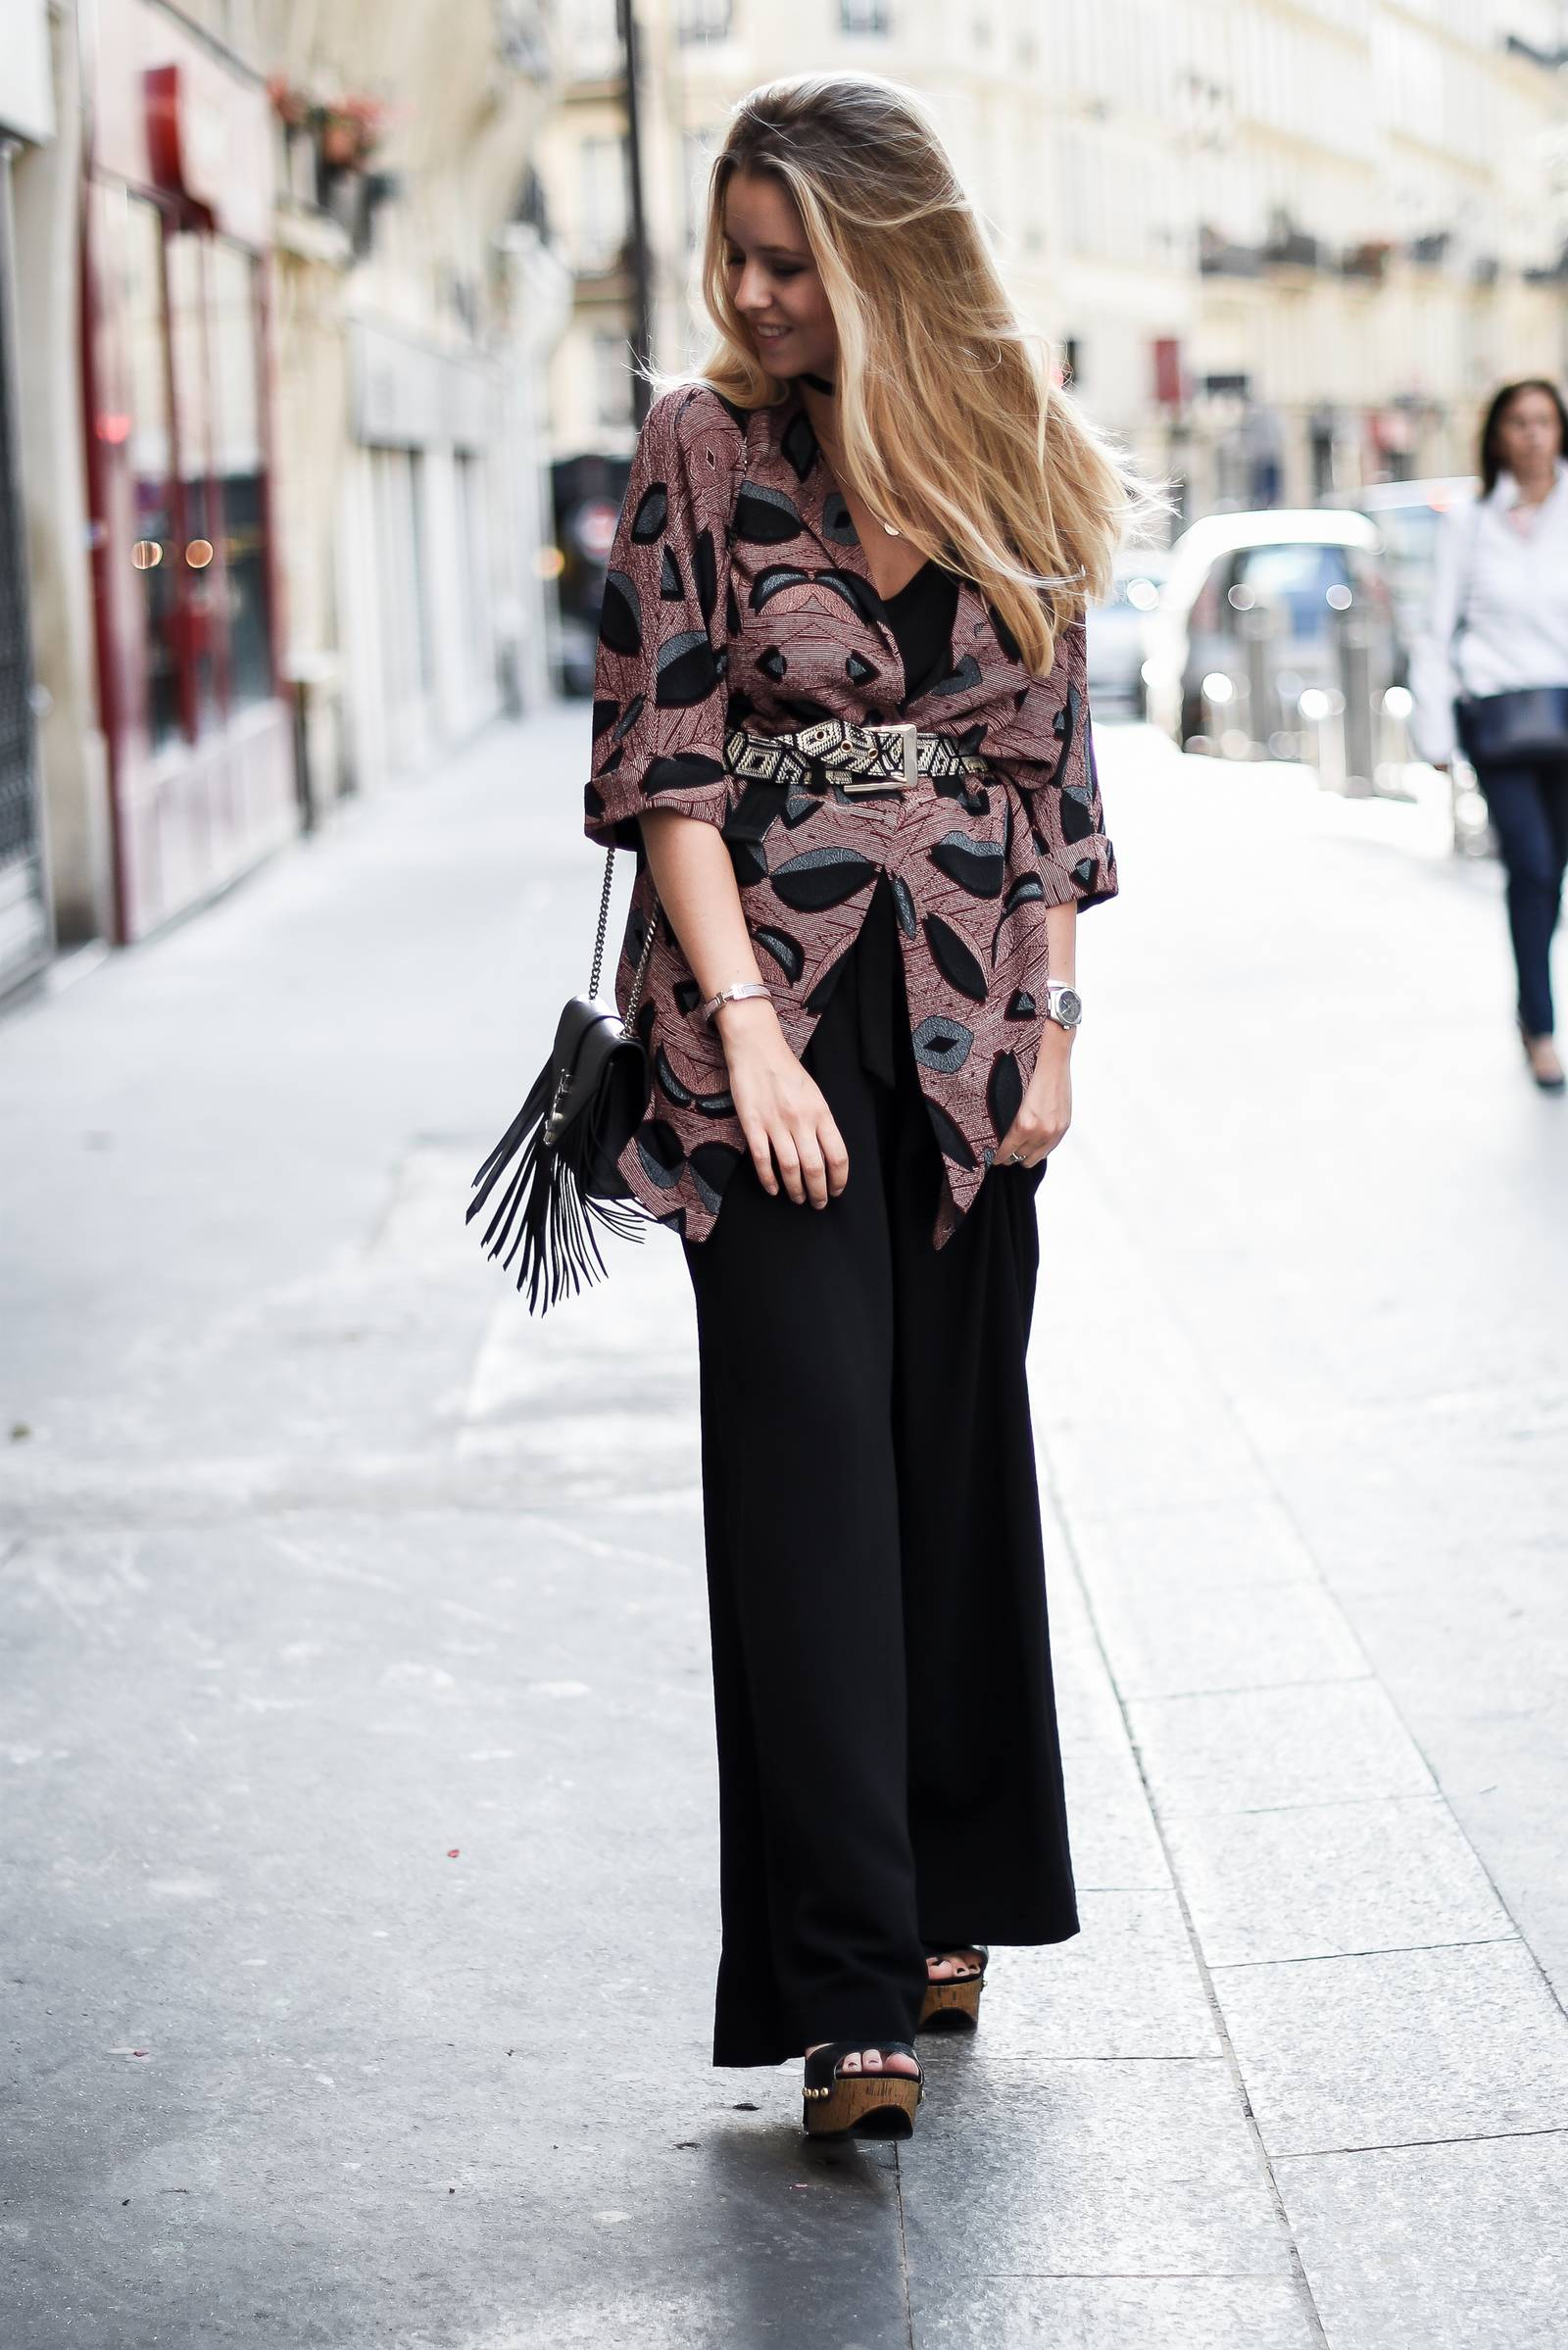 blog mode - Comment s'habiller pour aller au restaurant 11